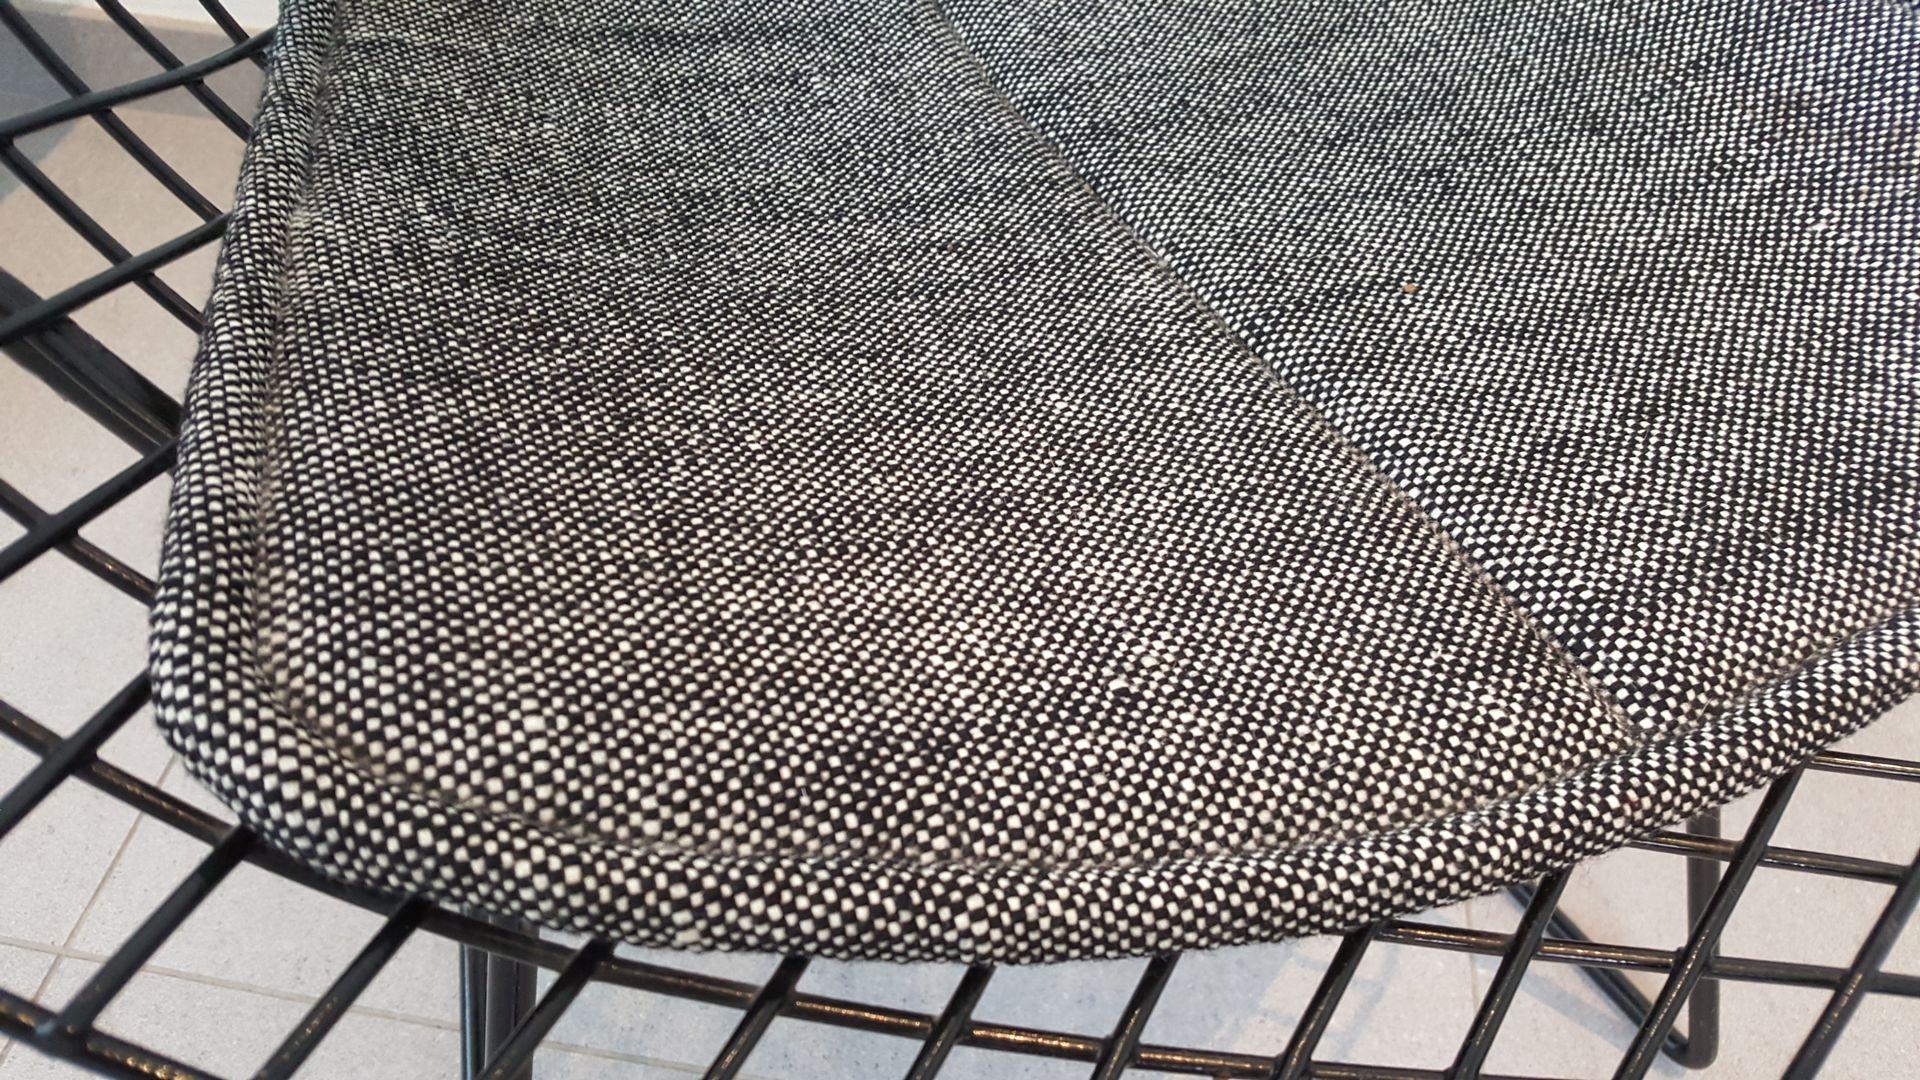 Bertoia diamond chair black - Black Diamond Chair By Harry Bertoia For Knoll 1950s